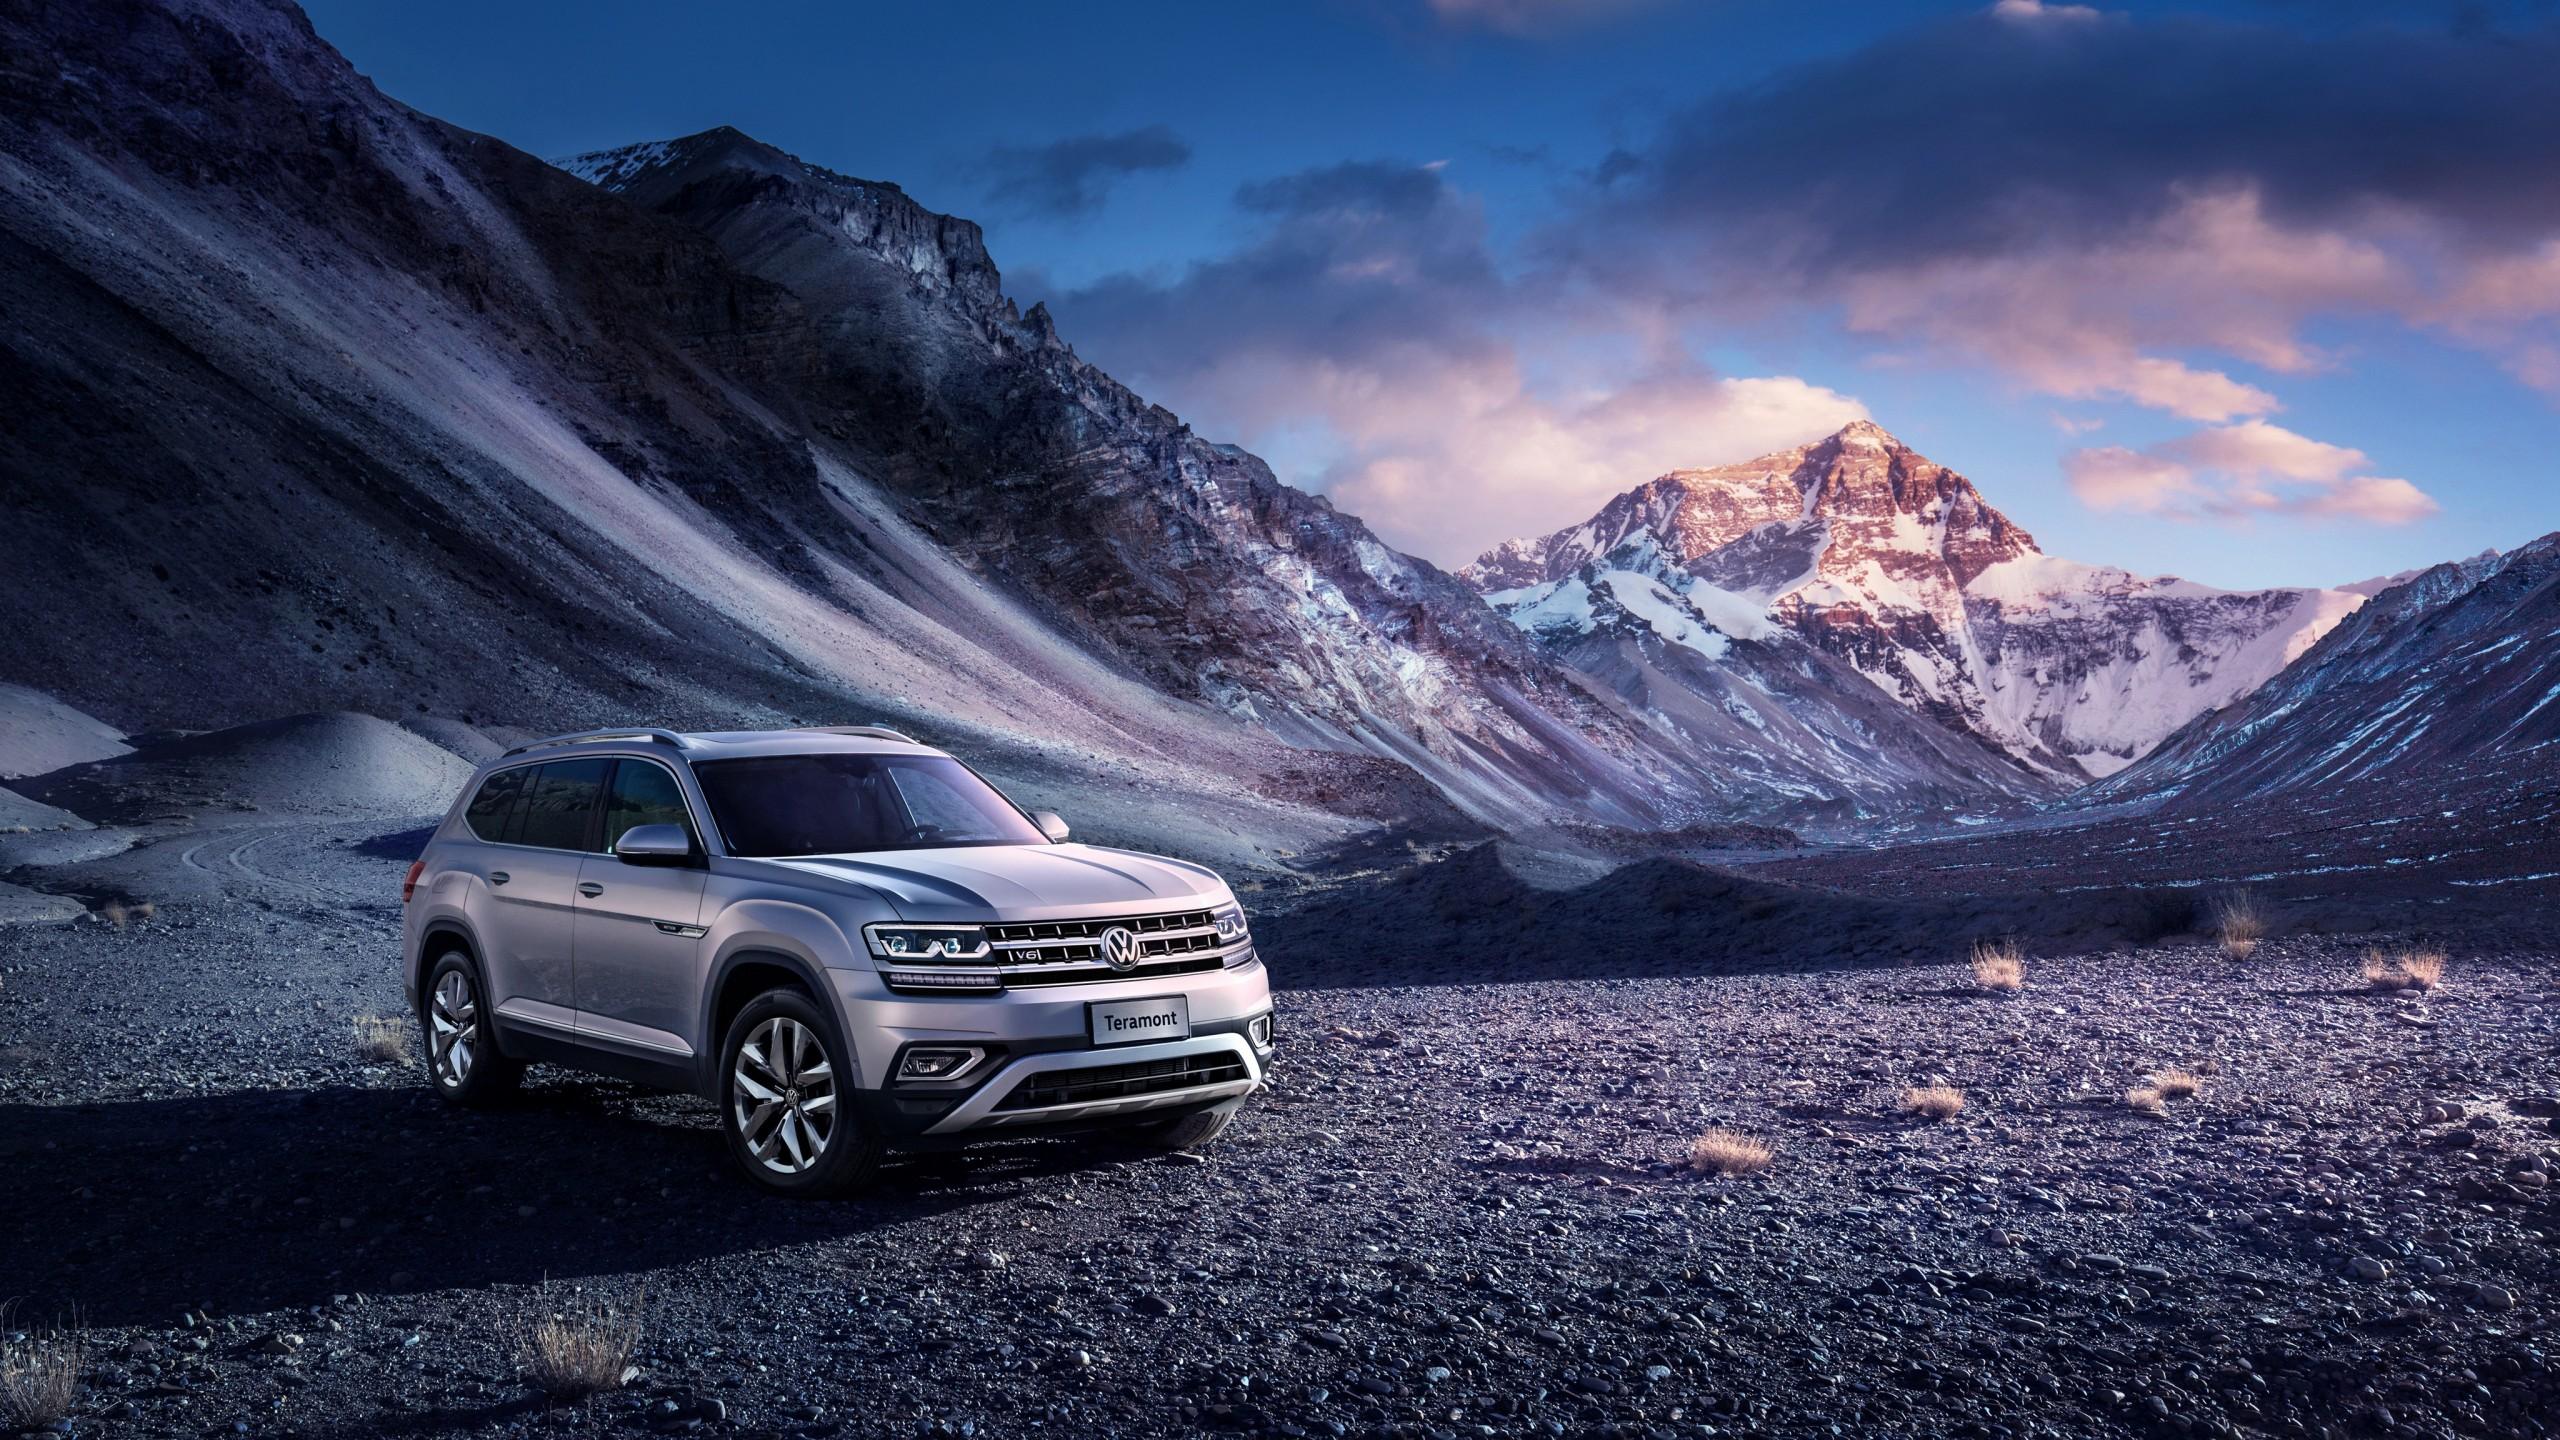 2019 volkswagen teramont 4k wallpaper hd car wallpapers id 9323 - 4k wallpaper download ...